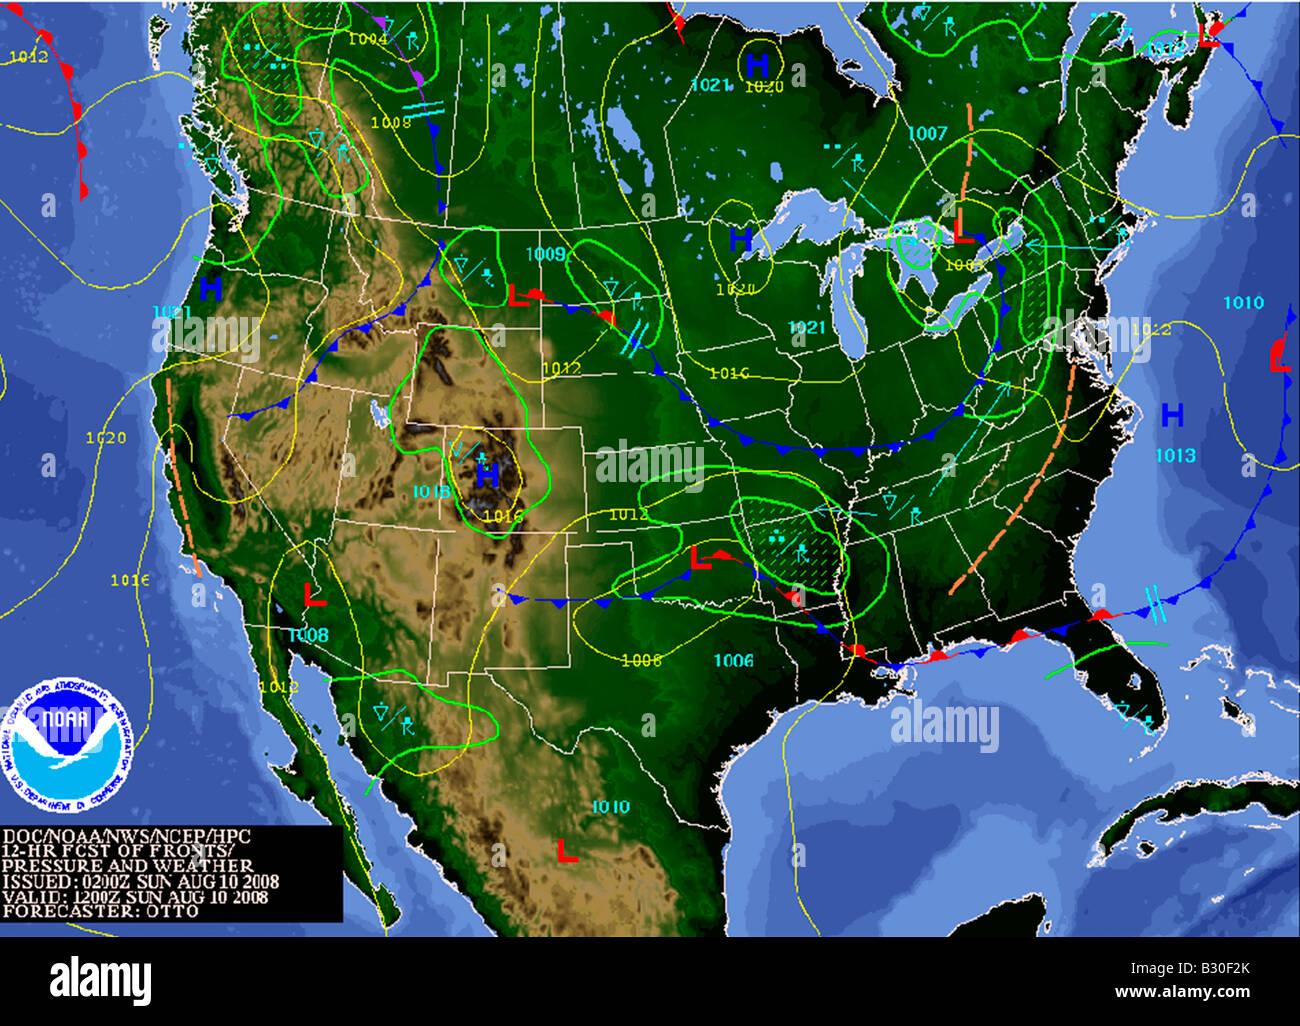 weather map North America Stock Photo: 19066171 - Alamy